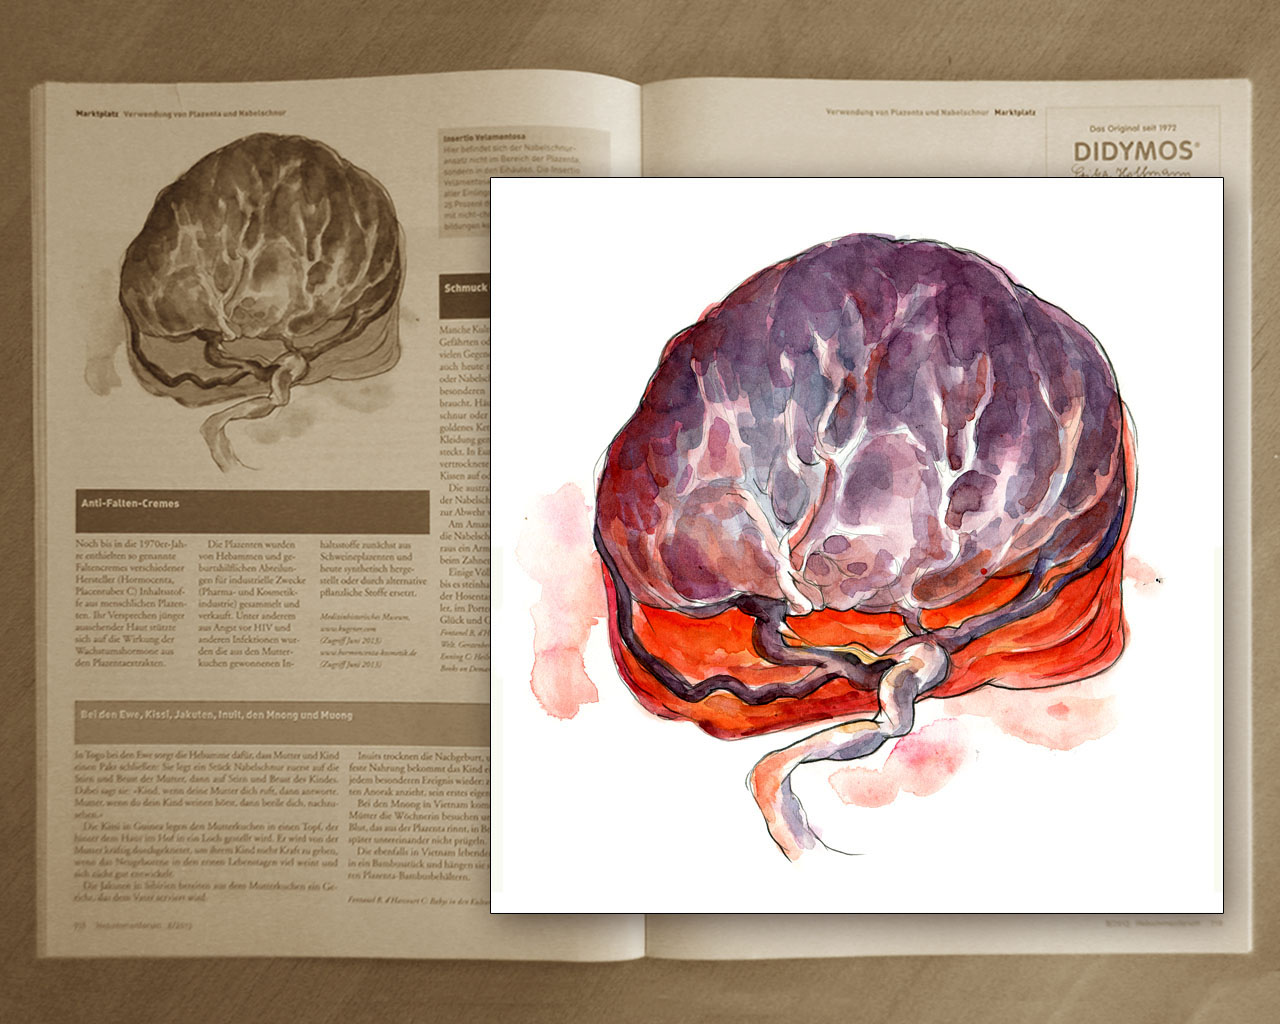 placenta with insertio velamentosa